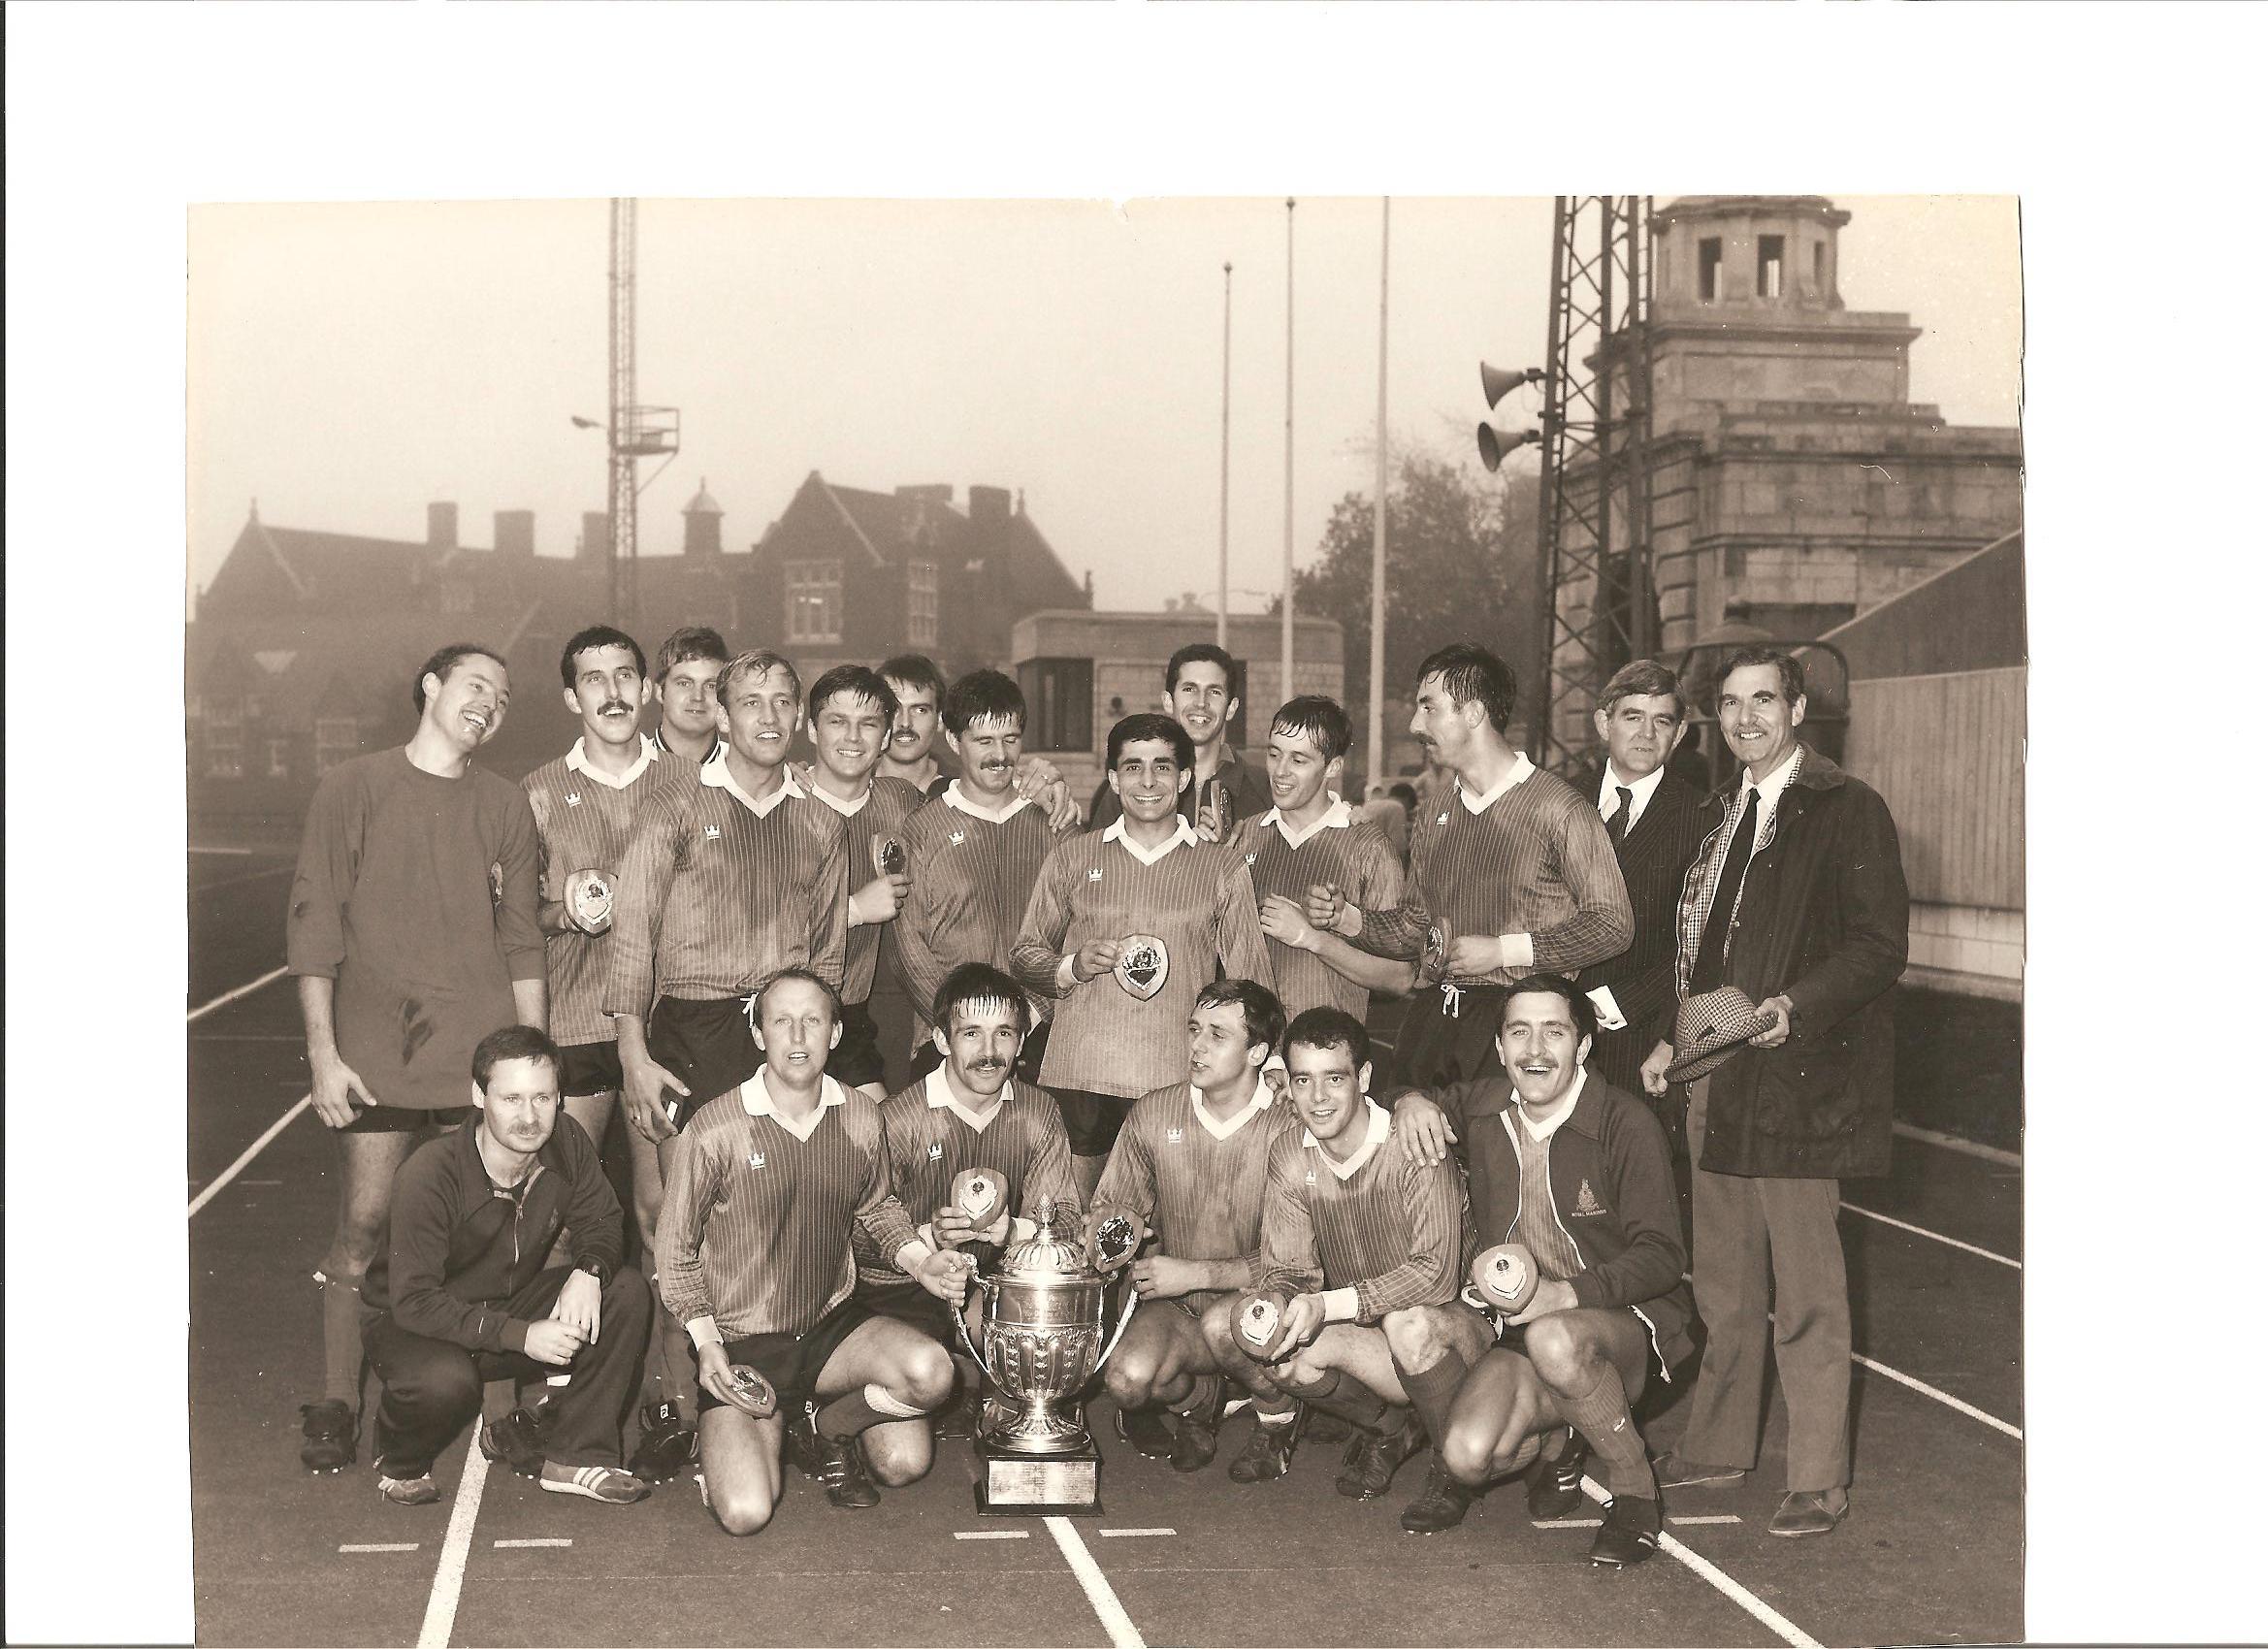 1985 Navy cup winners CTCRM 2 HMS Nelson